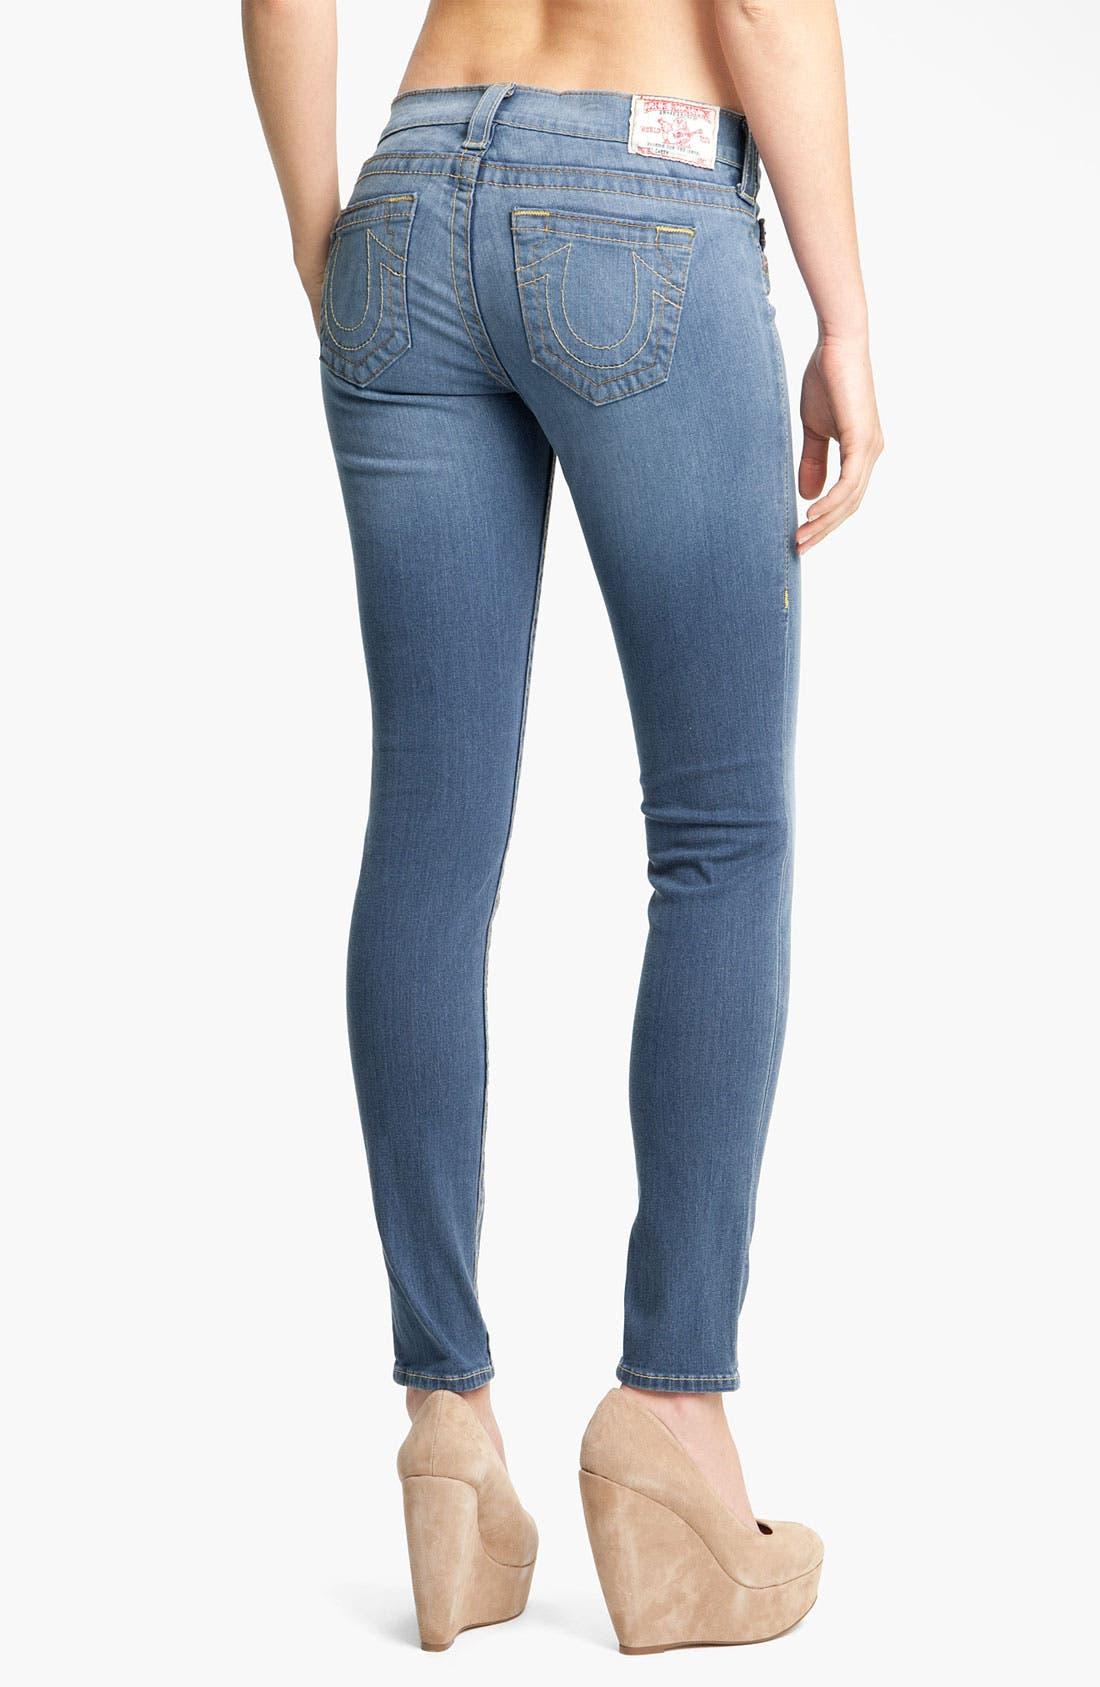 Alternate Image 2  - True Religion Brand Jeans 'Casey' Skinny Stretch Jeans (Stingray)